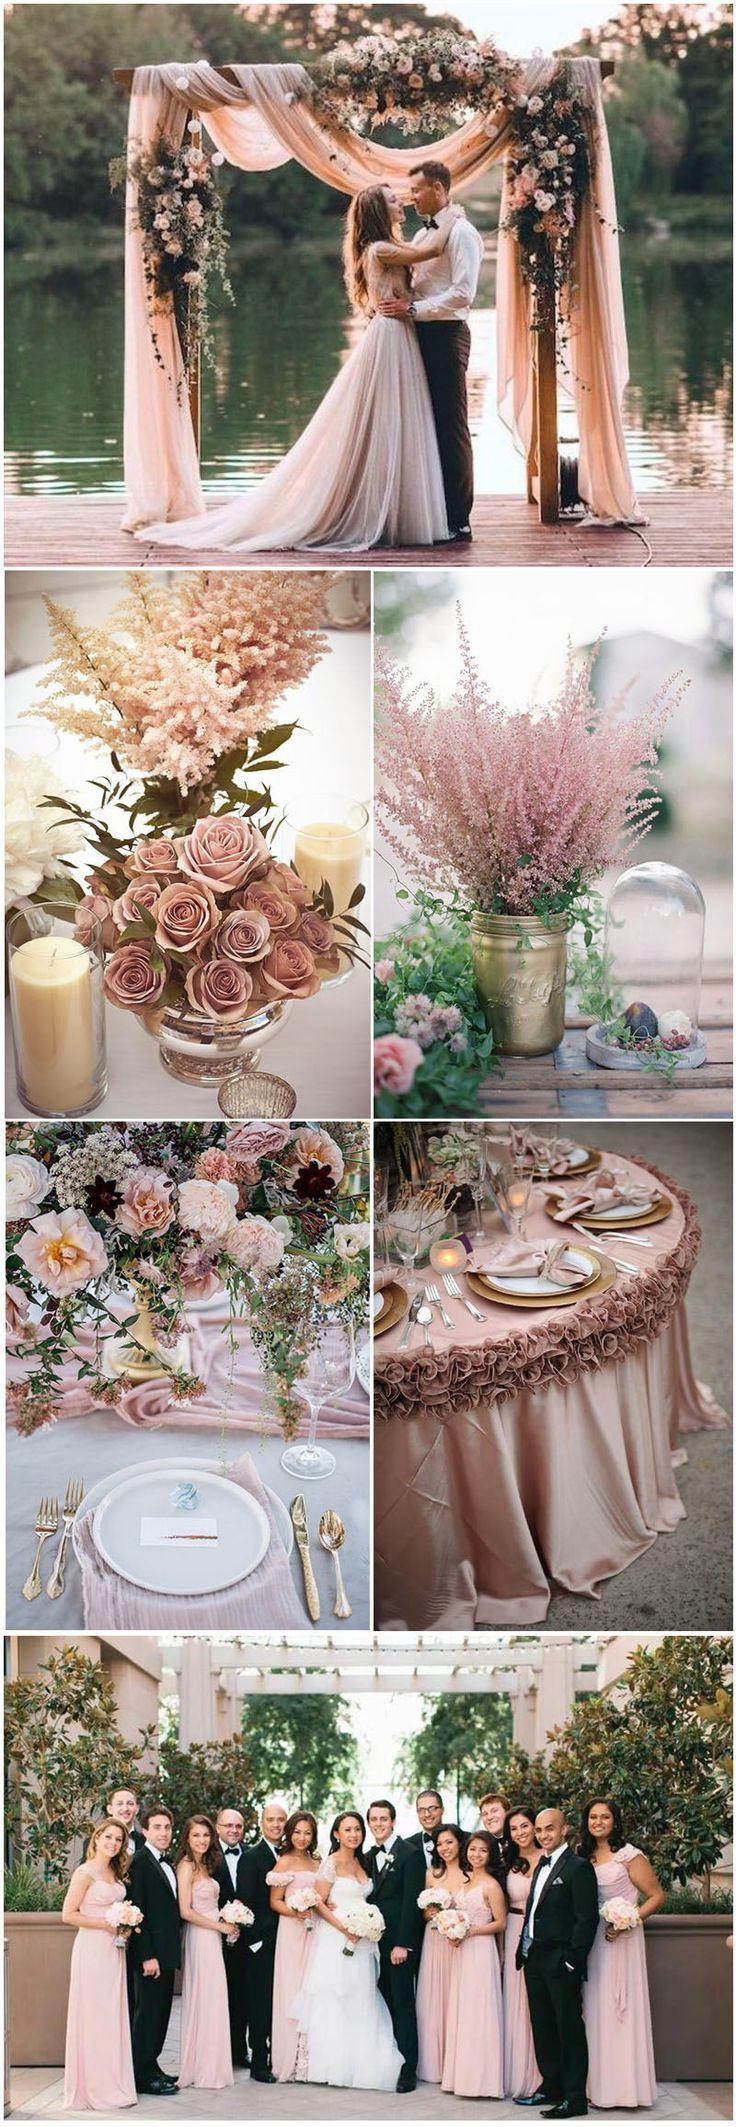 18 Romantic Dusty Rose Wedding Color Ideas for 2019 Weddings – Wedding Decorations